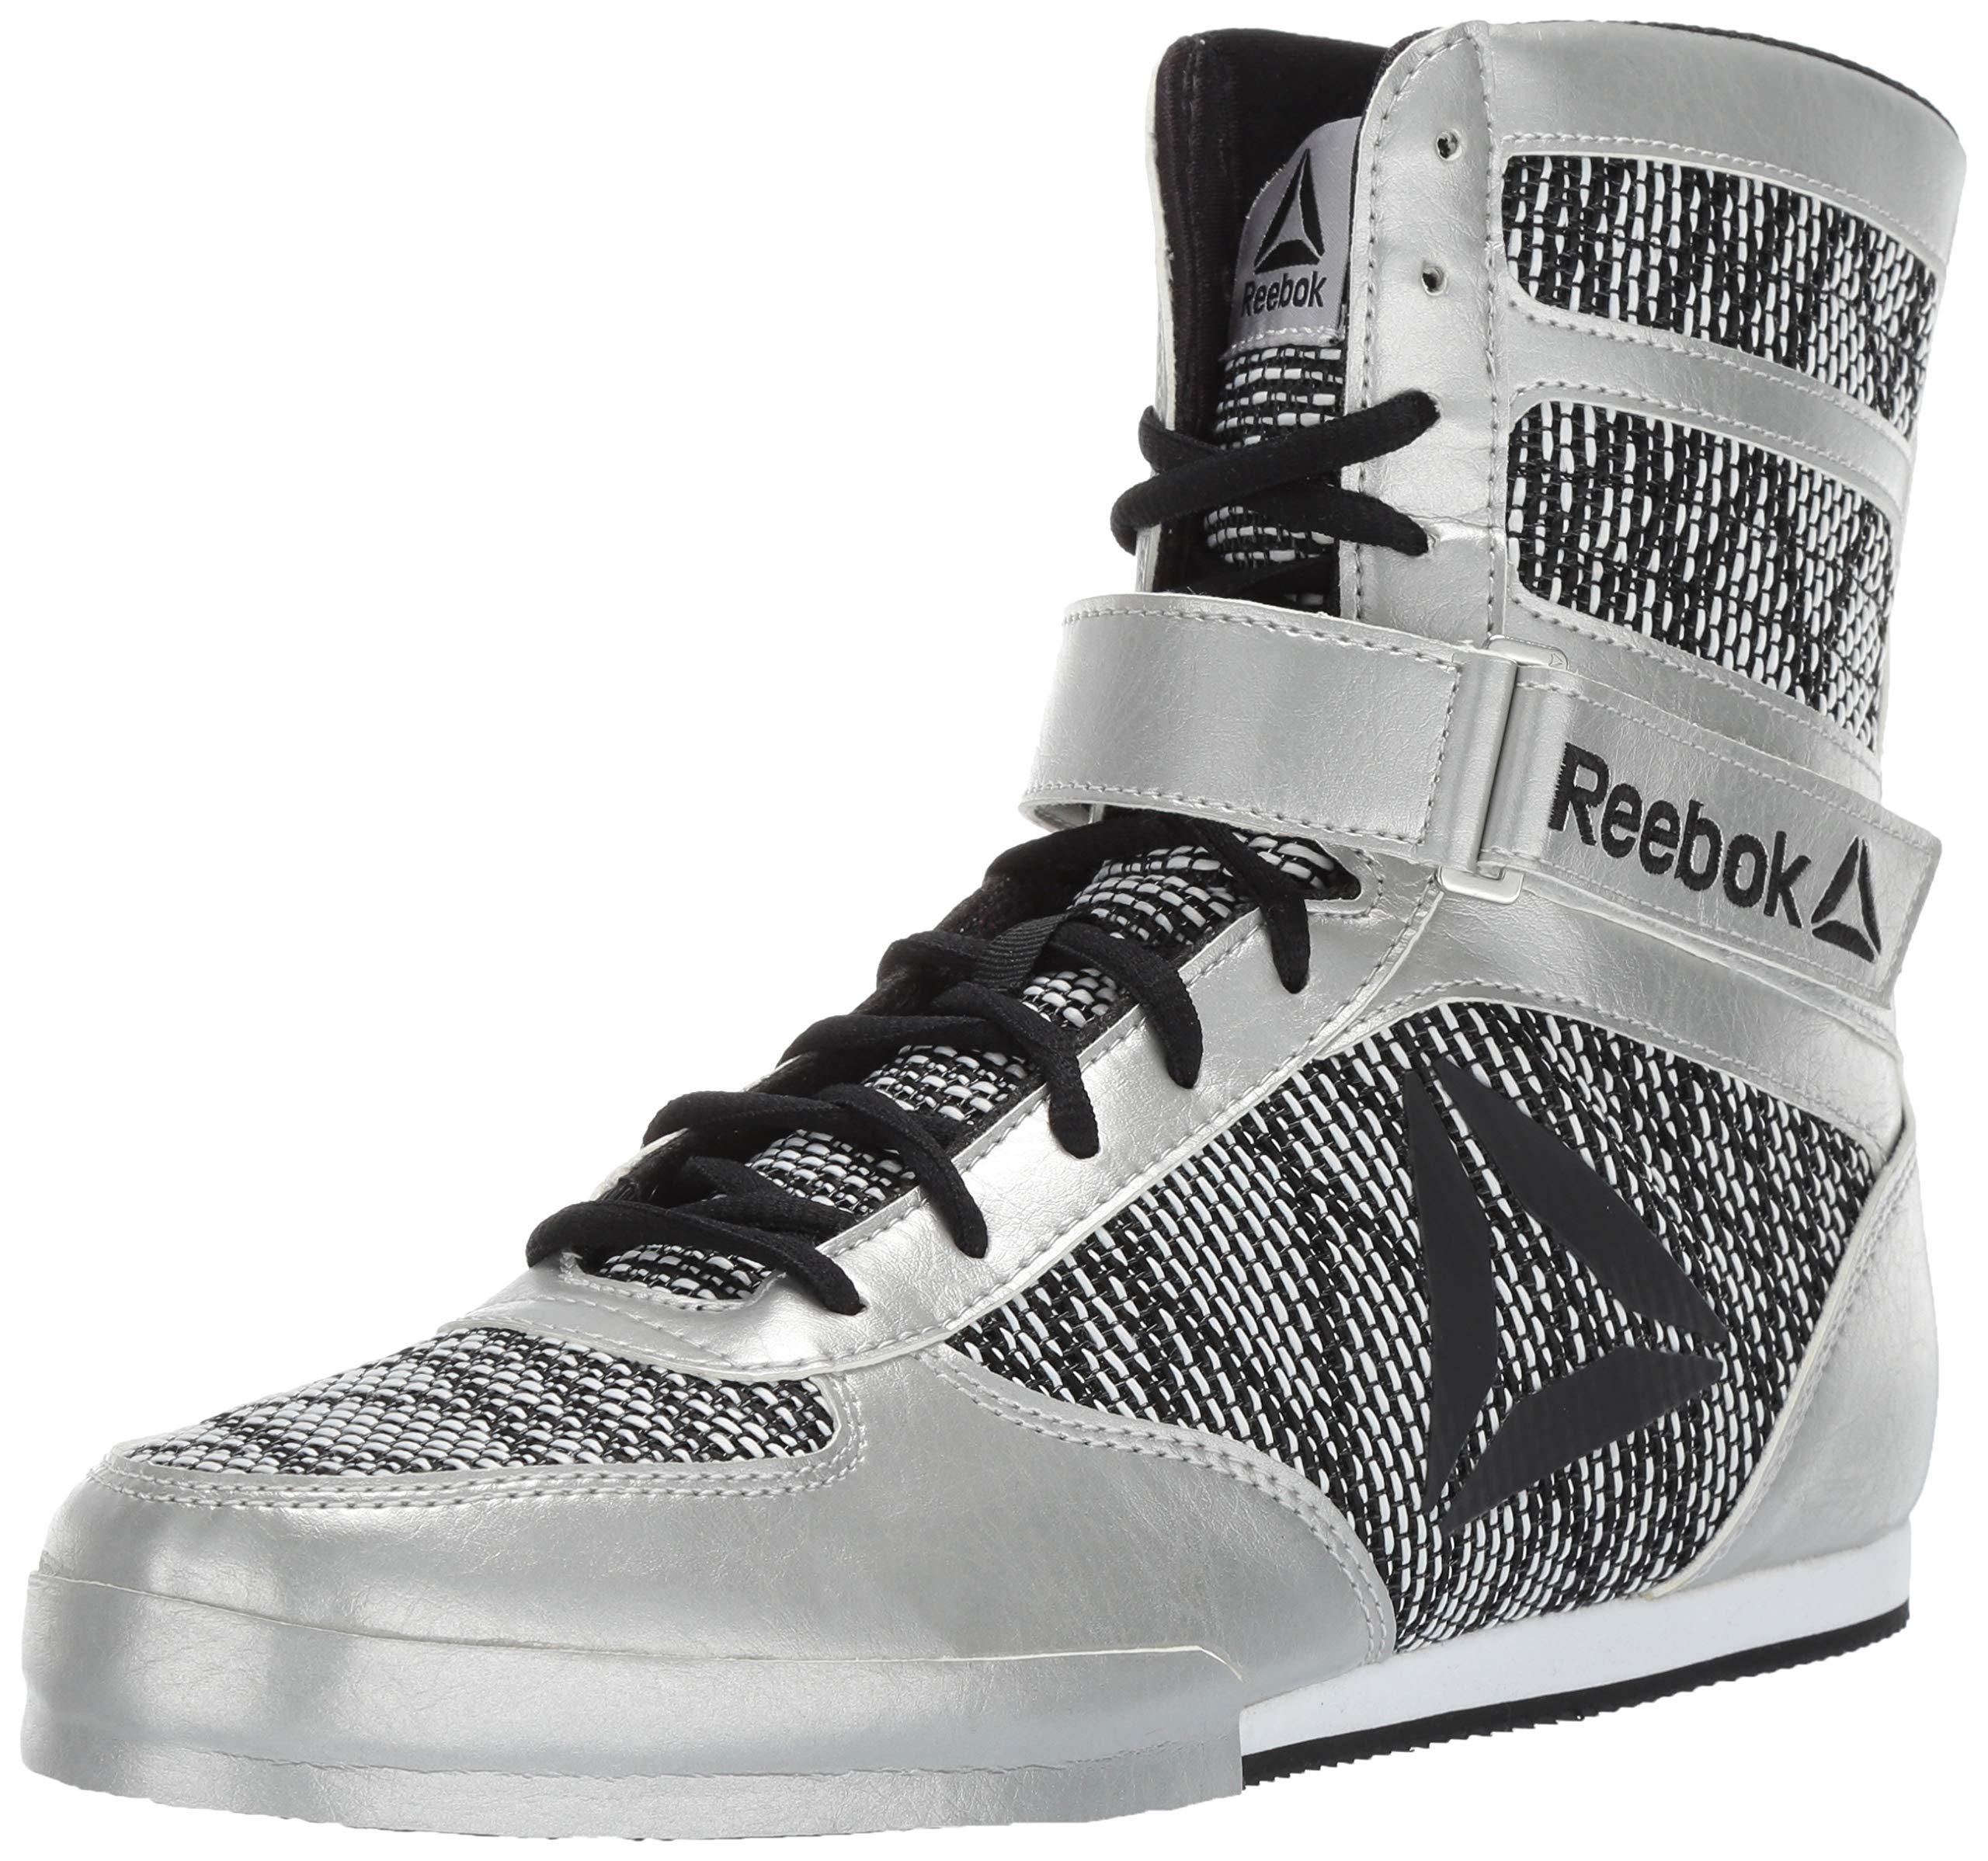 1ba11eade43 Galleon - Reebok Men s Boot Boxing Shoe